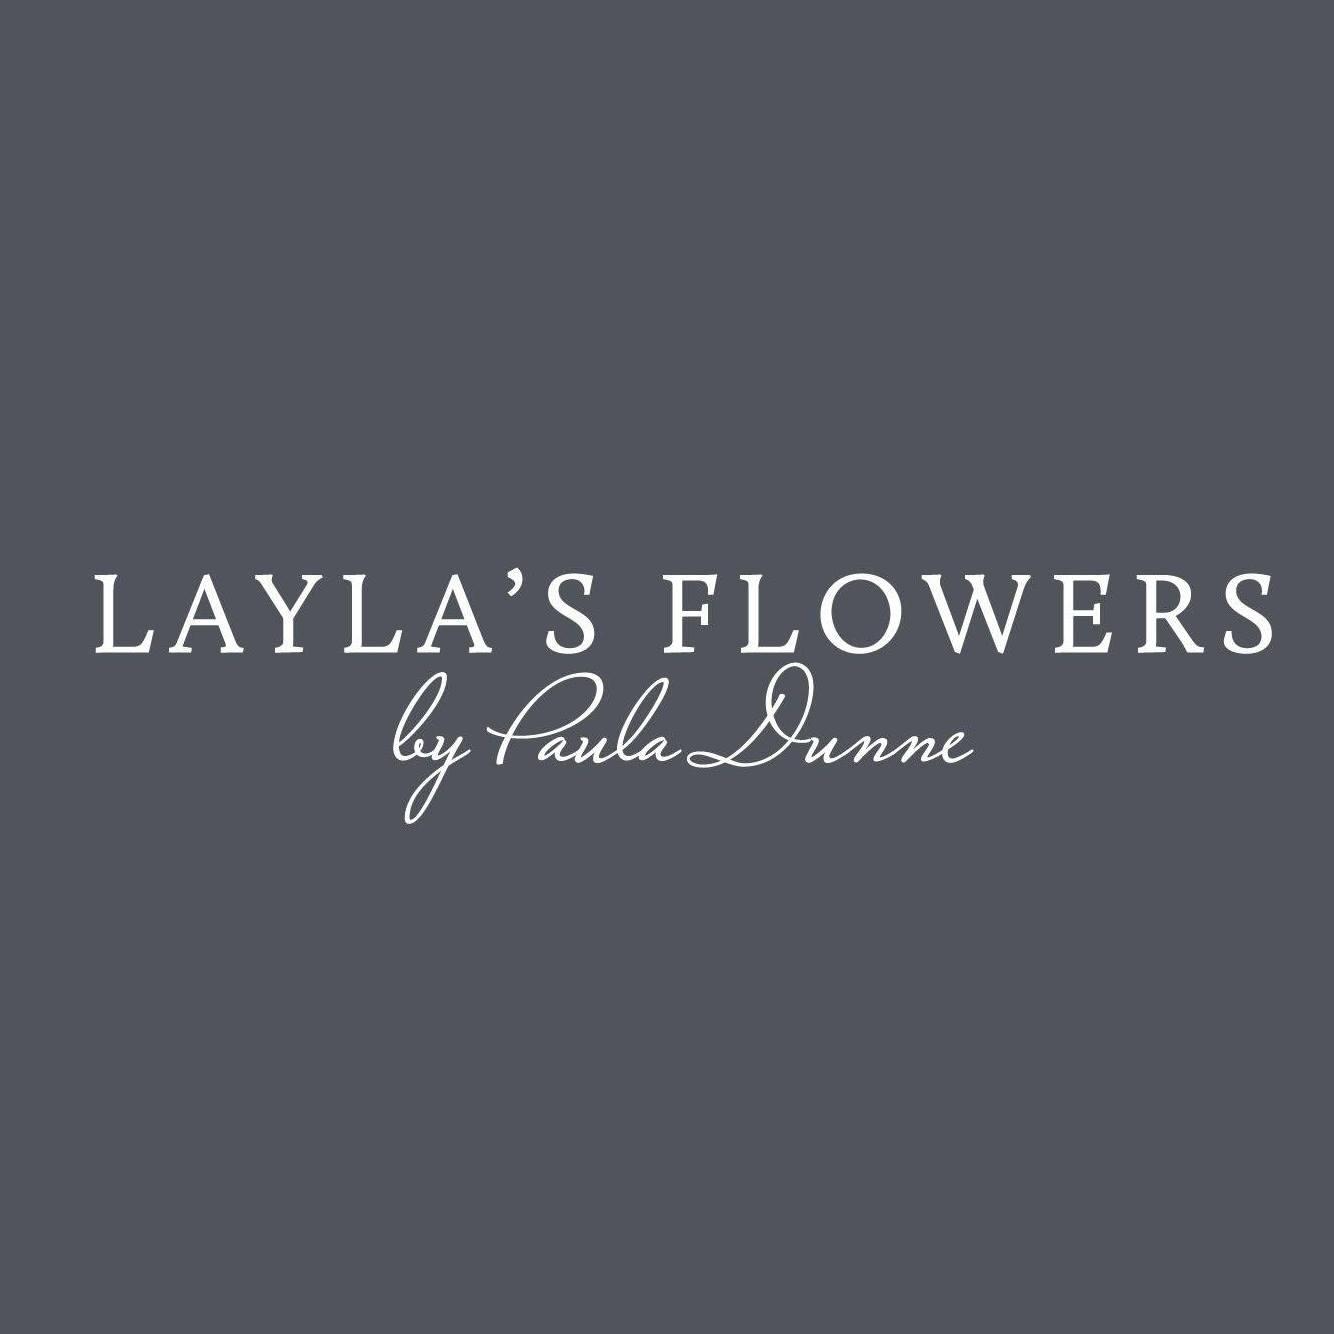 Layla's Flowers by Paula Dunne